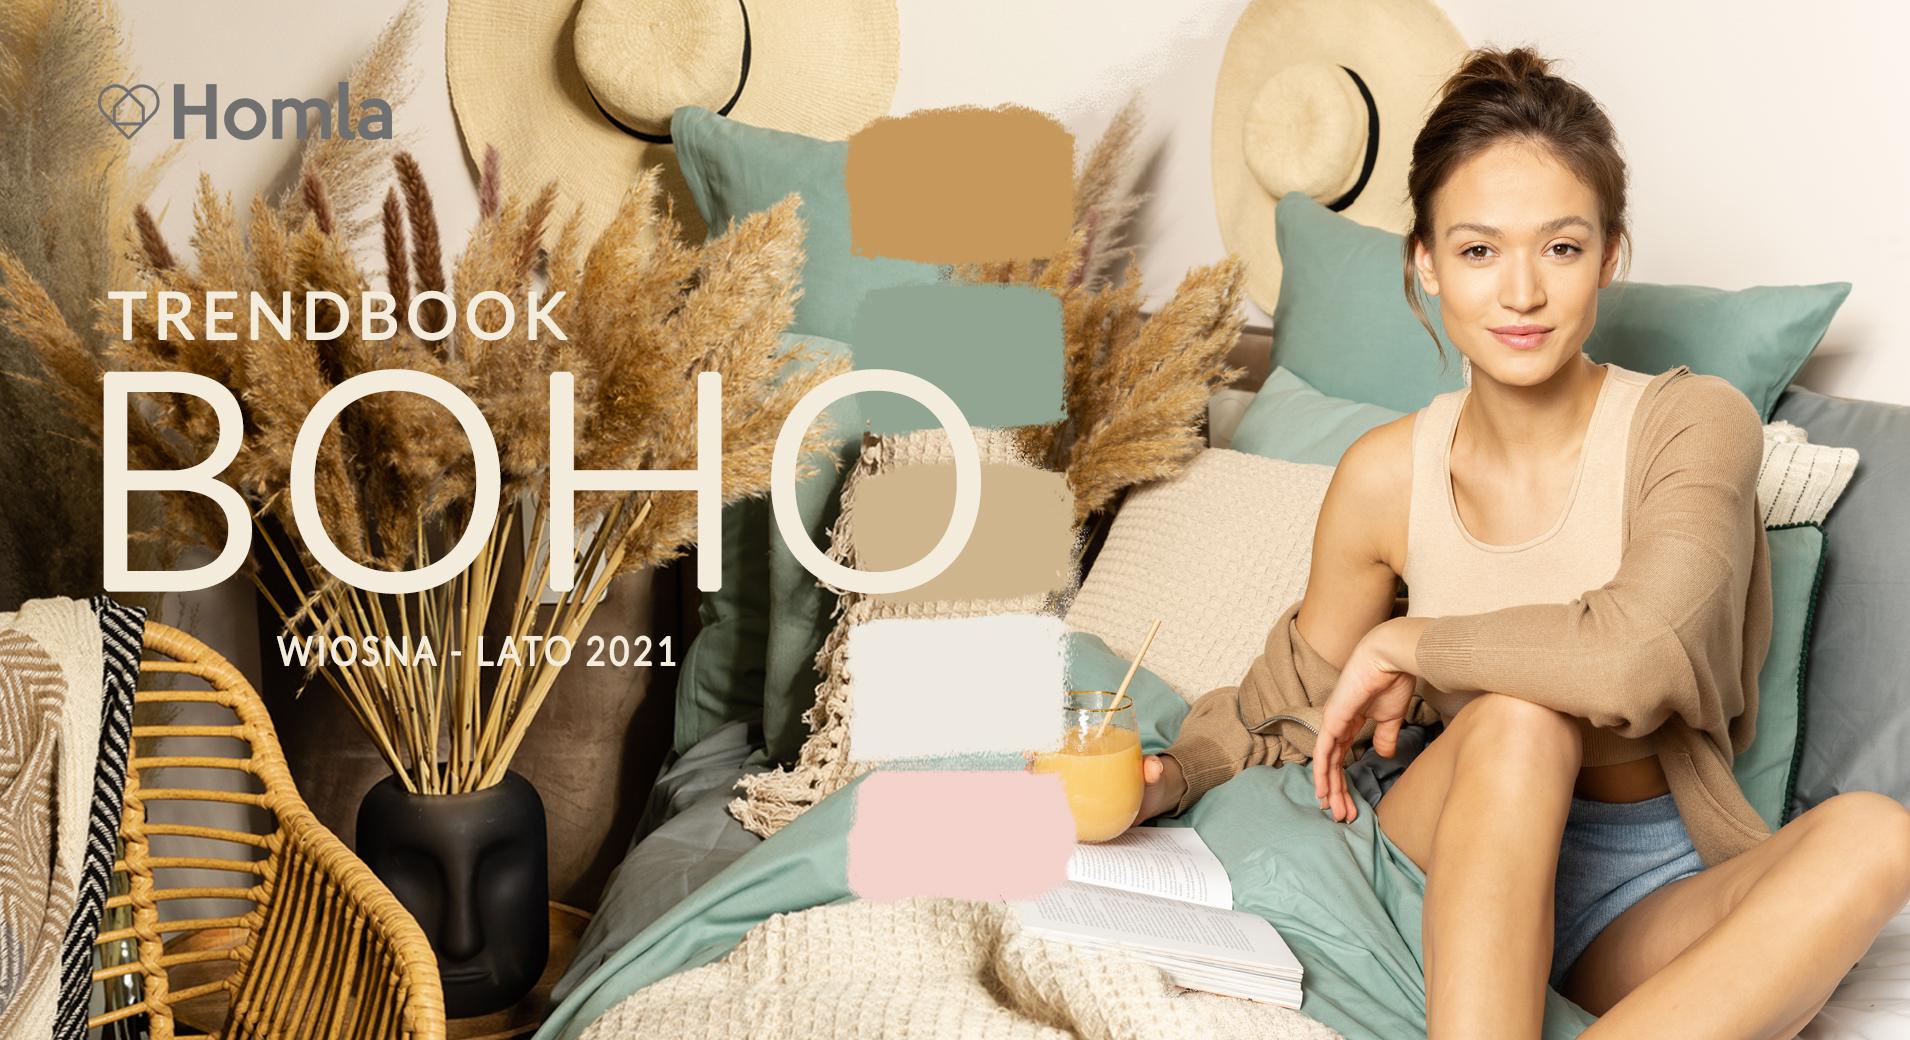 Trendbook Boho 0